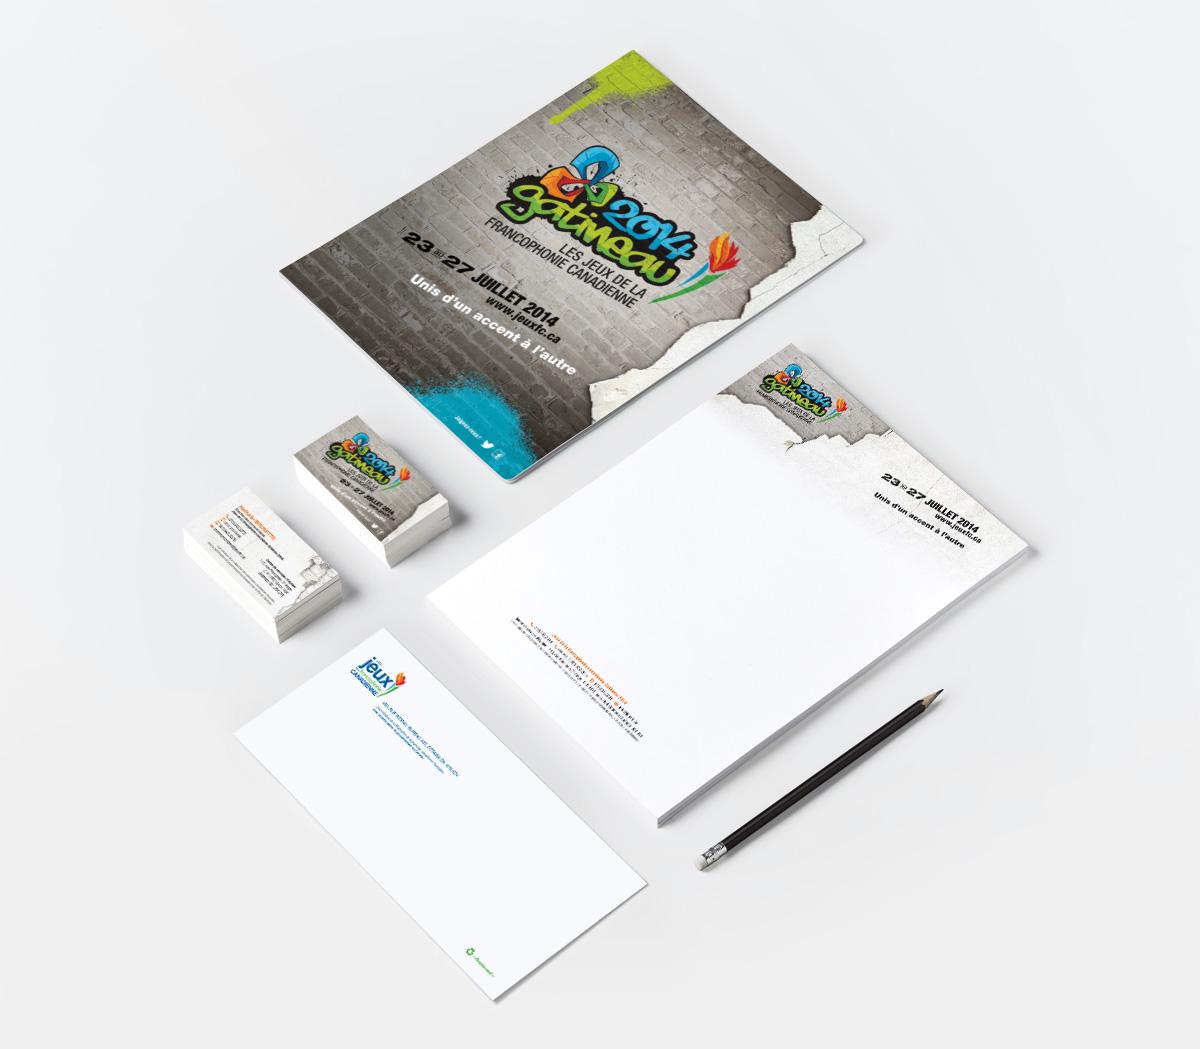 Canadian Francophone Games 2014 - Branding